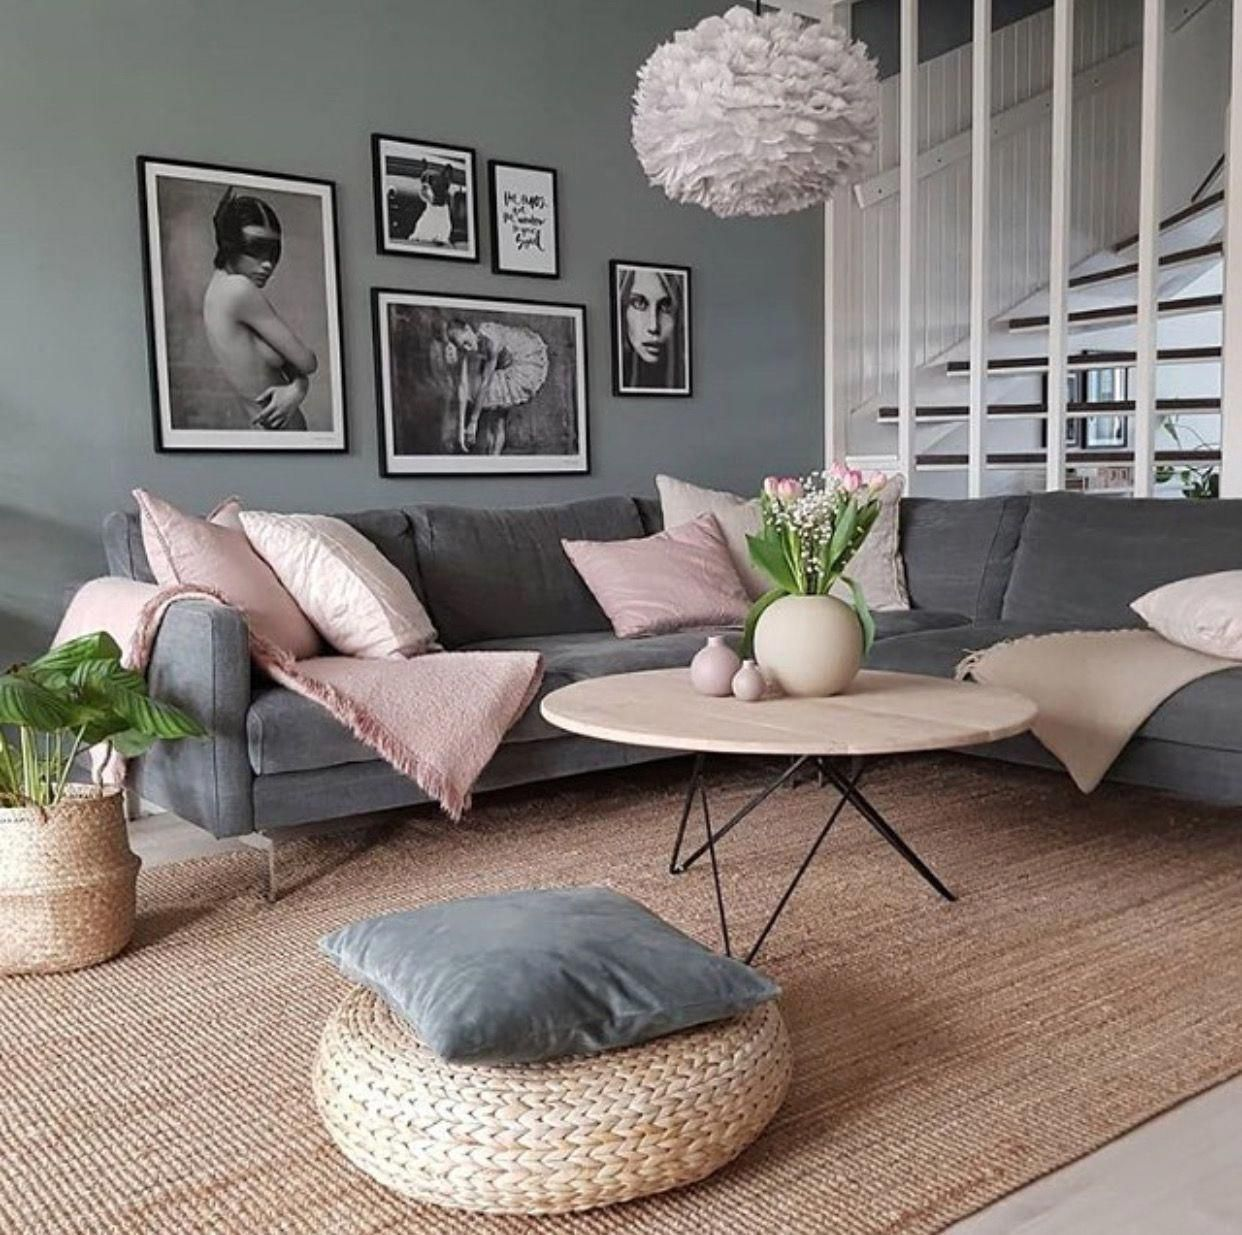 9 Minimalist Living Room Decoration Tips Minimalist Living Room Decor Minimalist Living Room Minimalist Home Decor